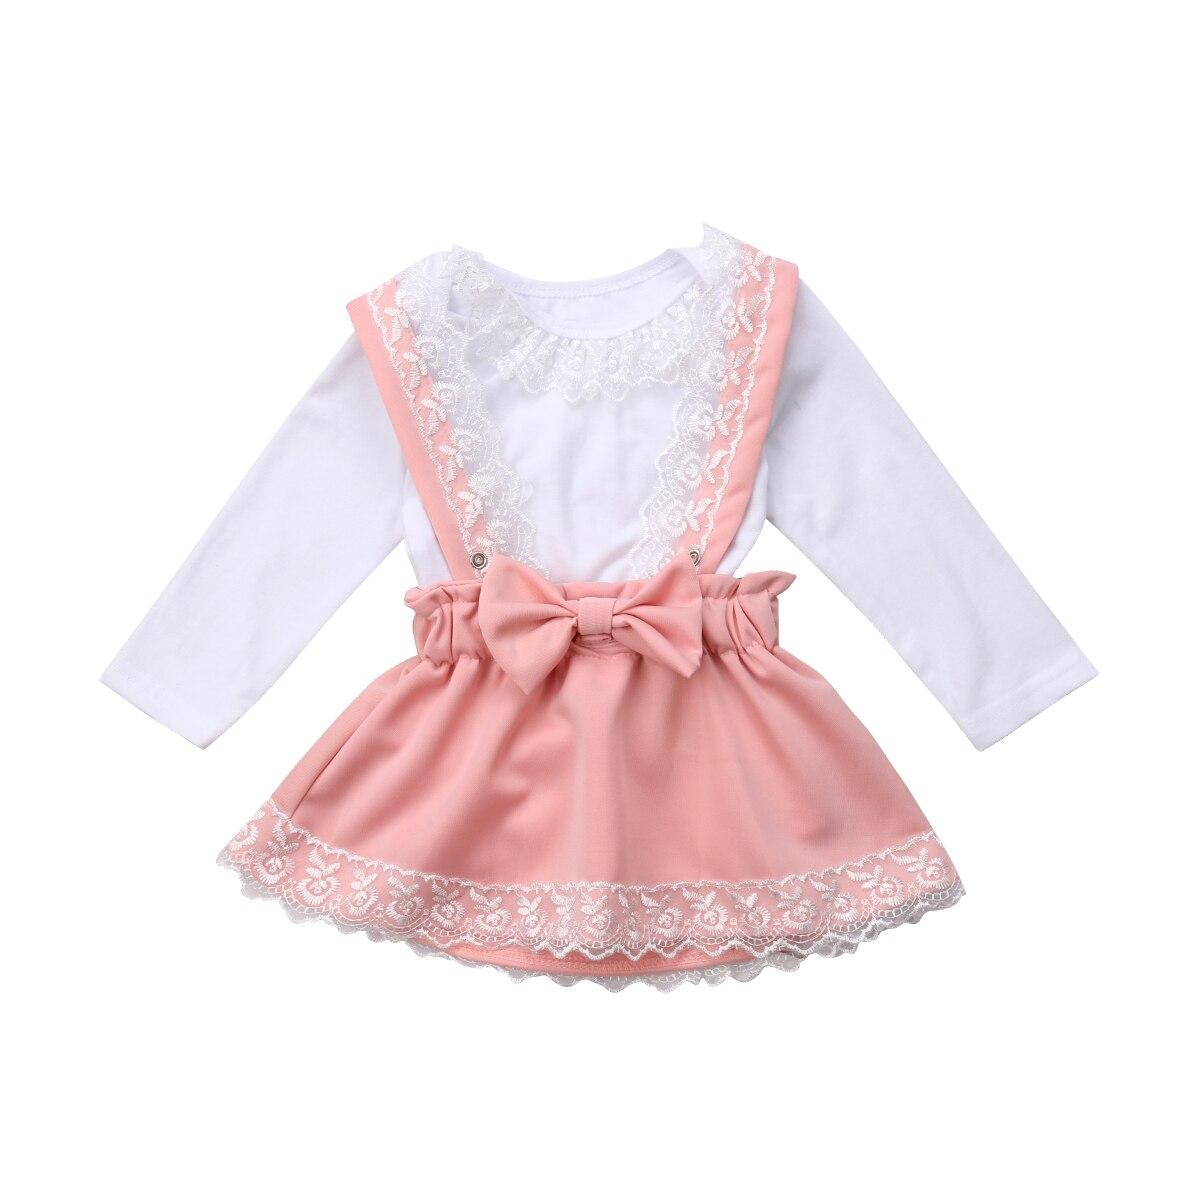 Ropa de encaje para niñas recién nacidas, mono, Tops de manga larga, falda de fiesta con lazo de encaje, 2 uds, ropa bonita para niñas bebés 0-3T